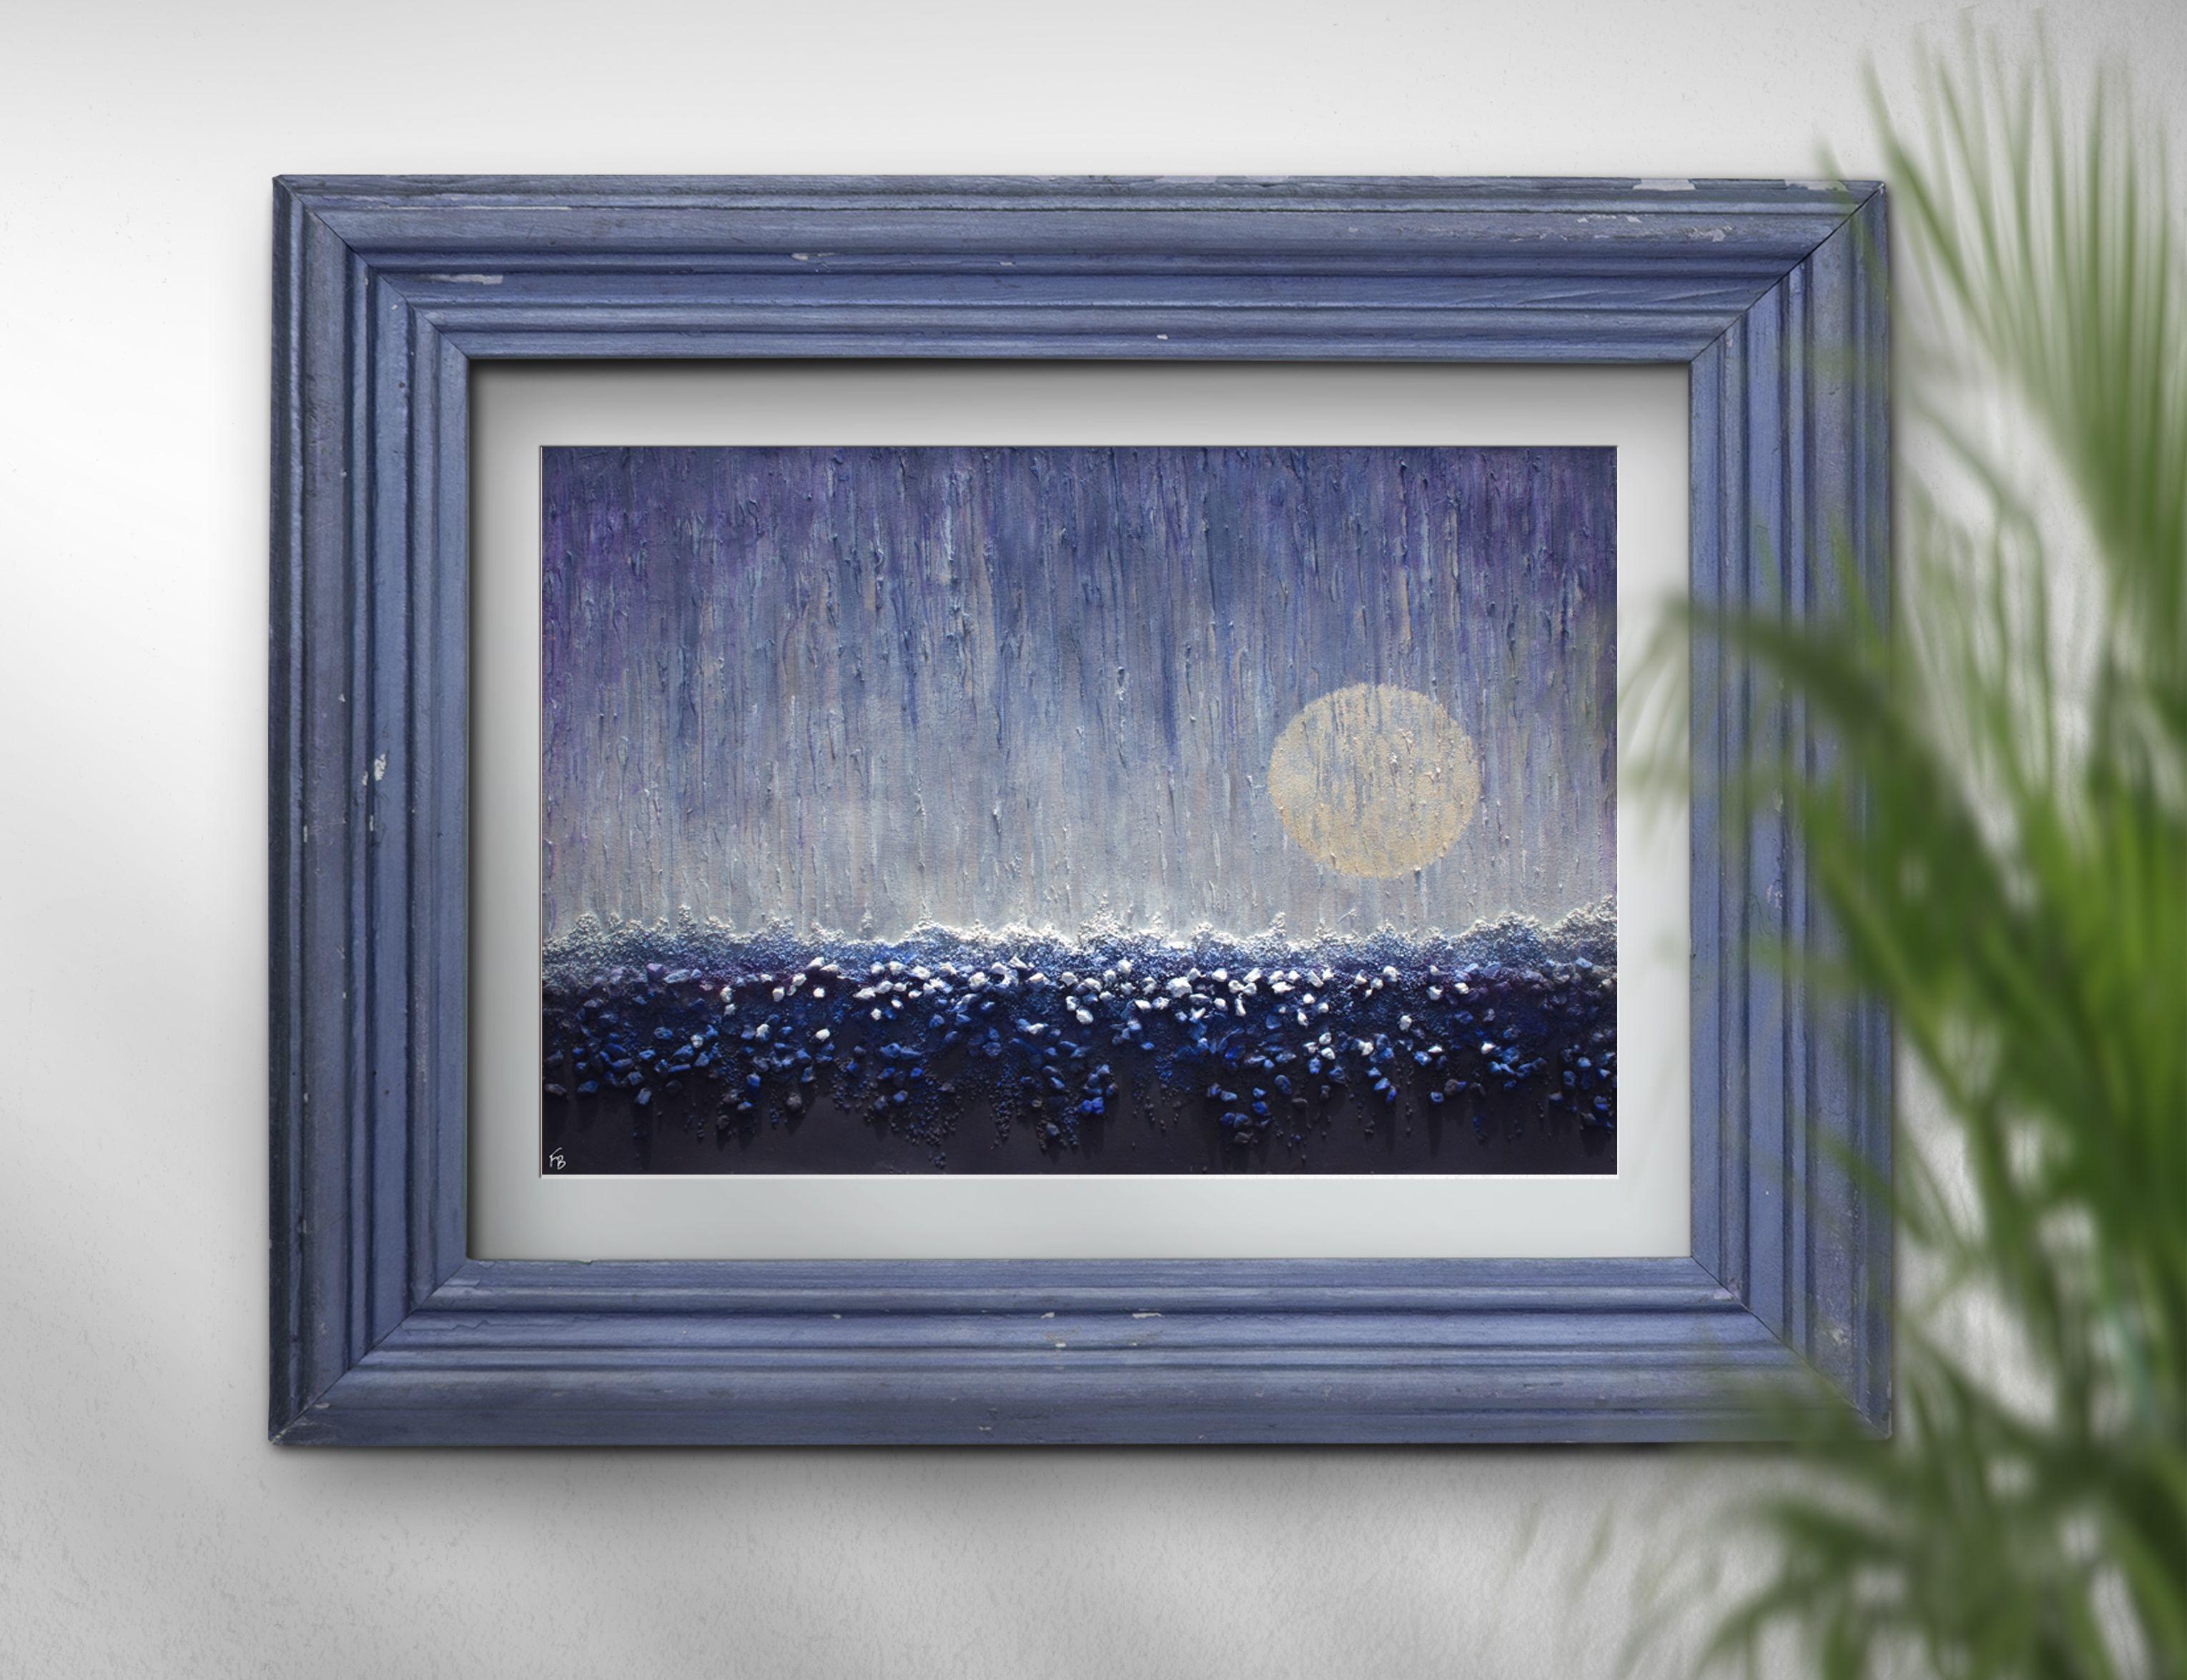 New moonus rising moon art painting original by frabor mixed